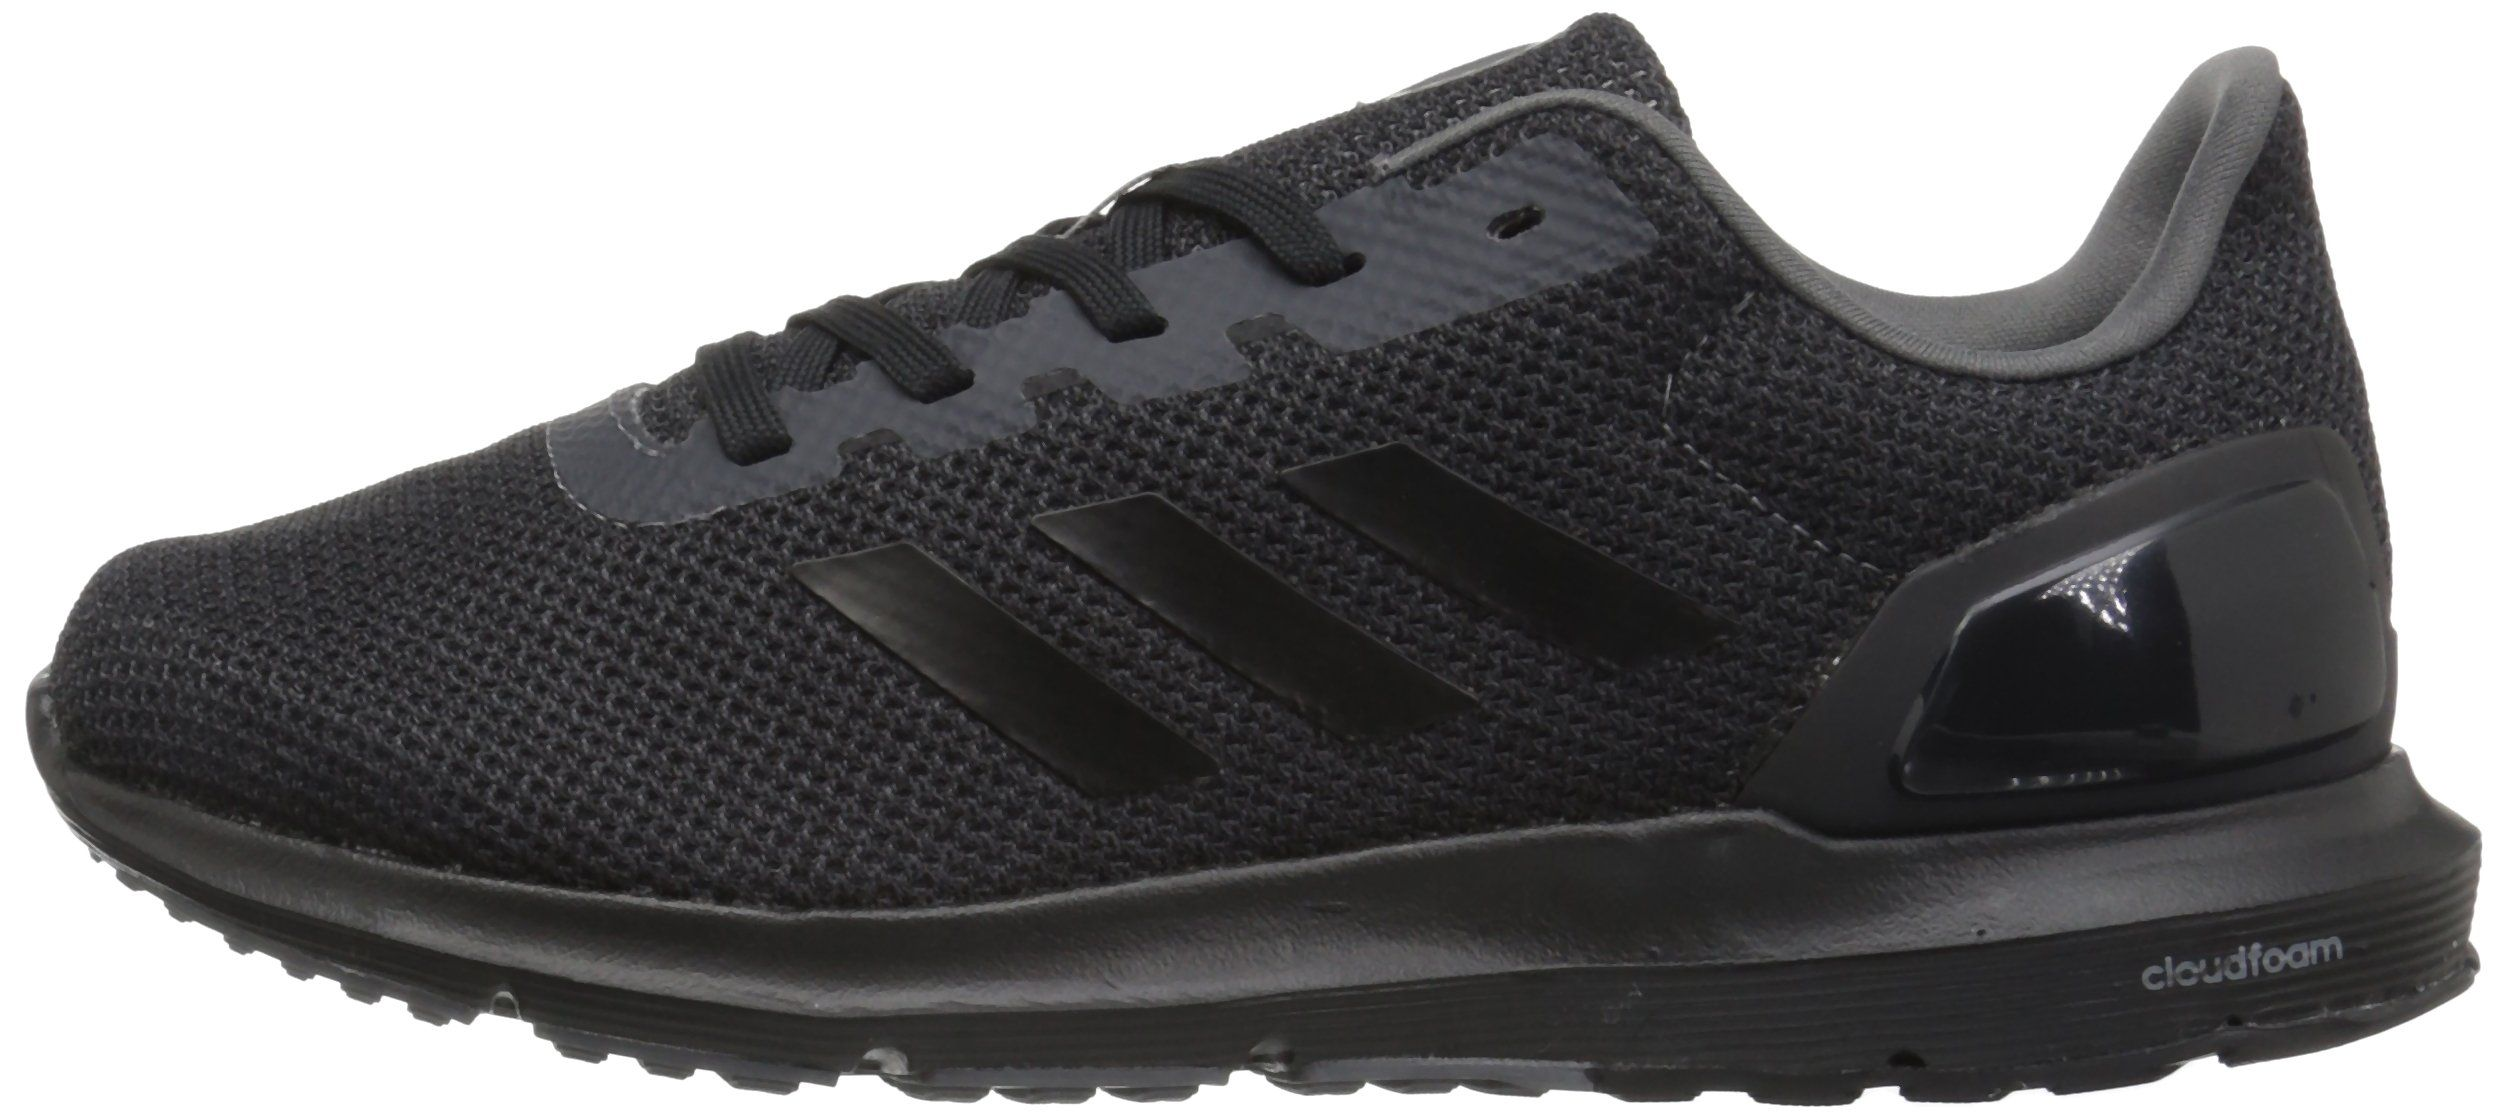 8440bef2bc4f0b adidas Mens Cosmic 2 Sl m Running Shoe Black Black Grey Five 8.5 Medium US     Click image for more details-affiliate link.  adidaswomensrunningshoes